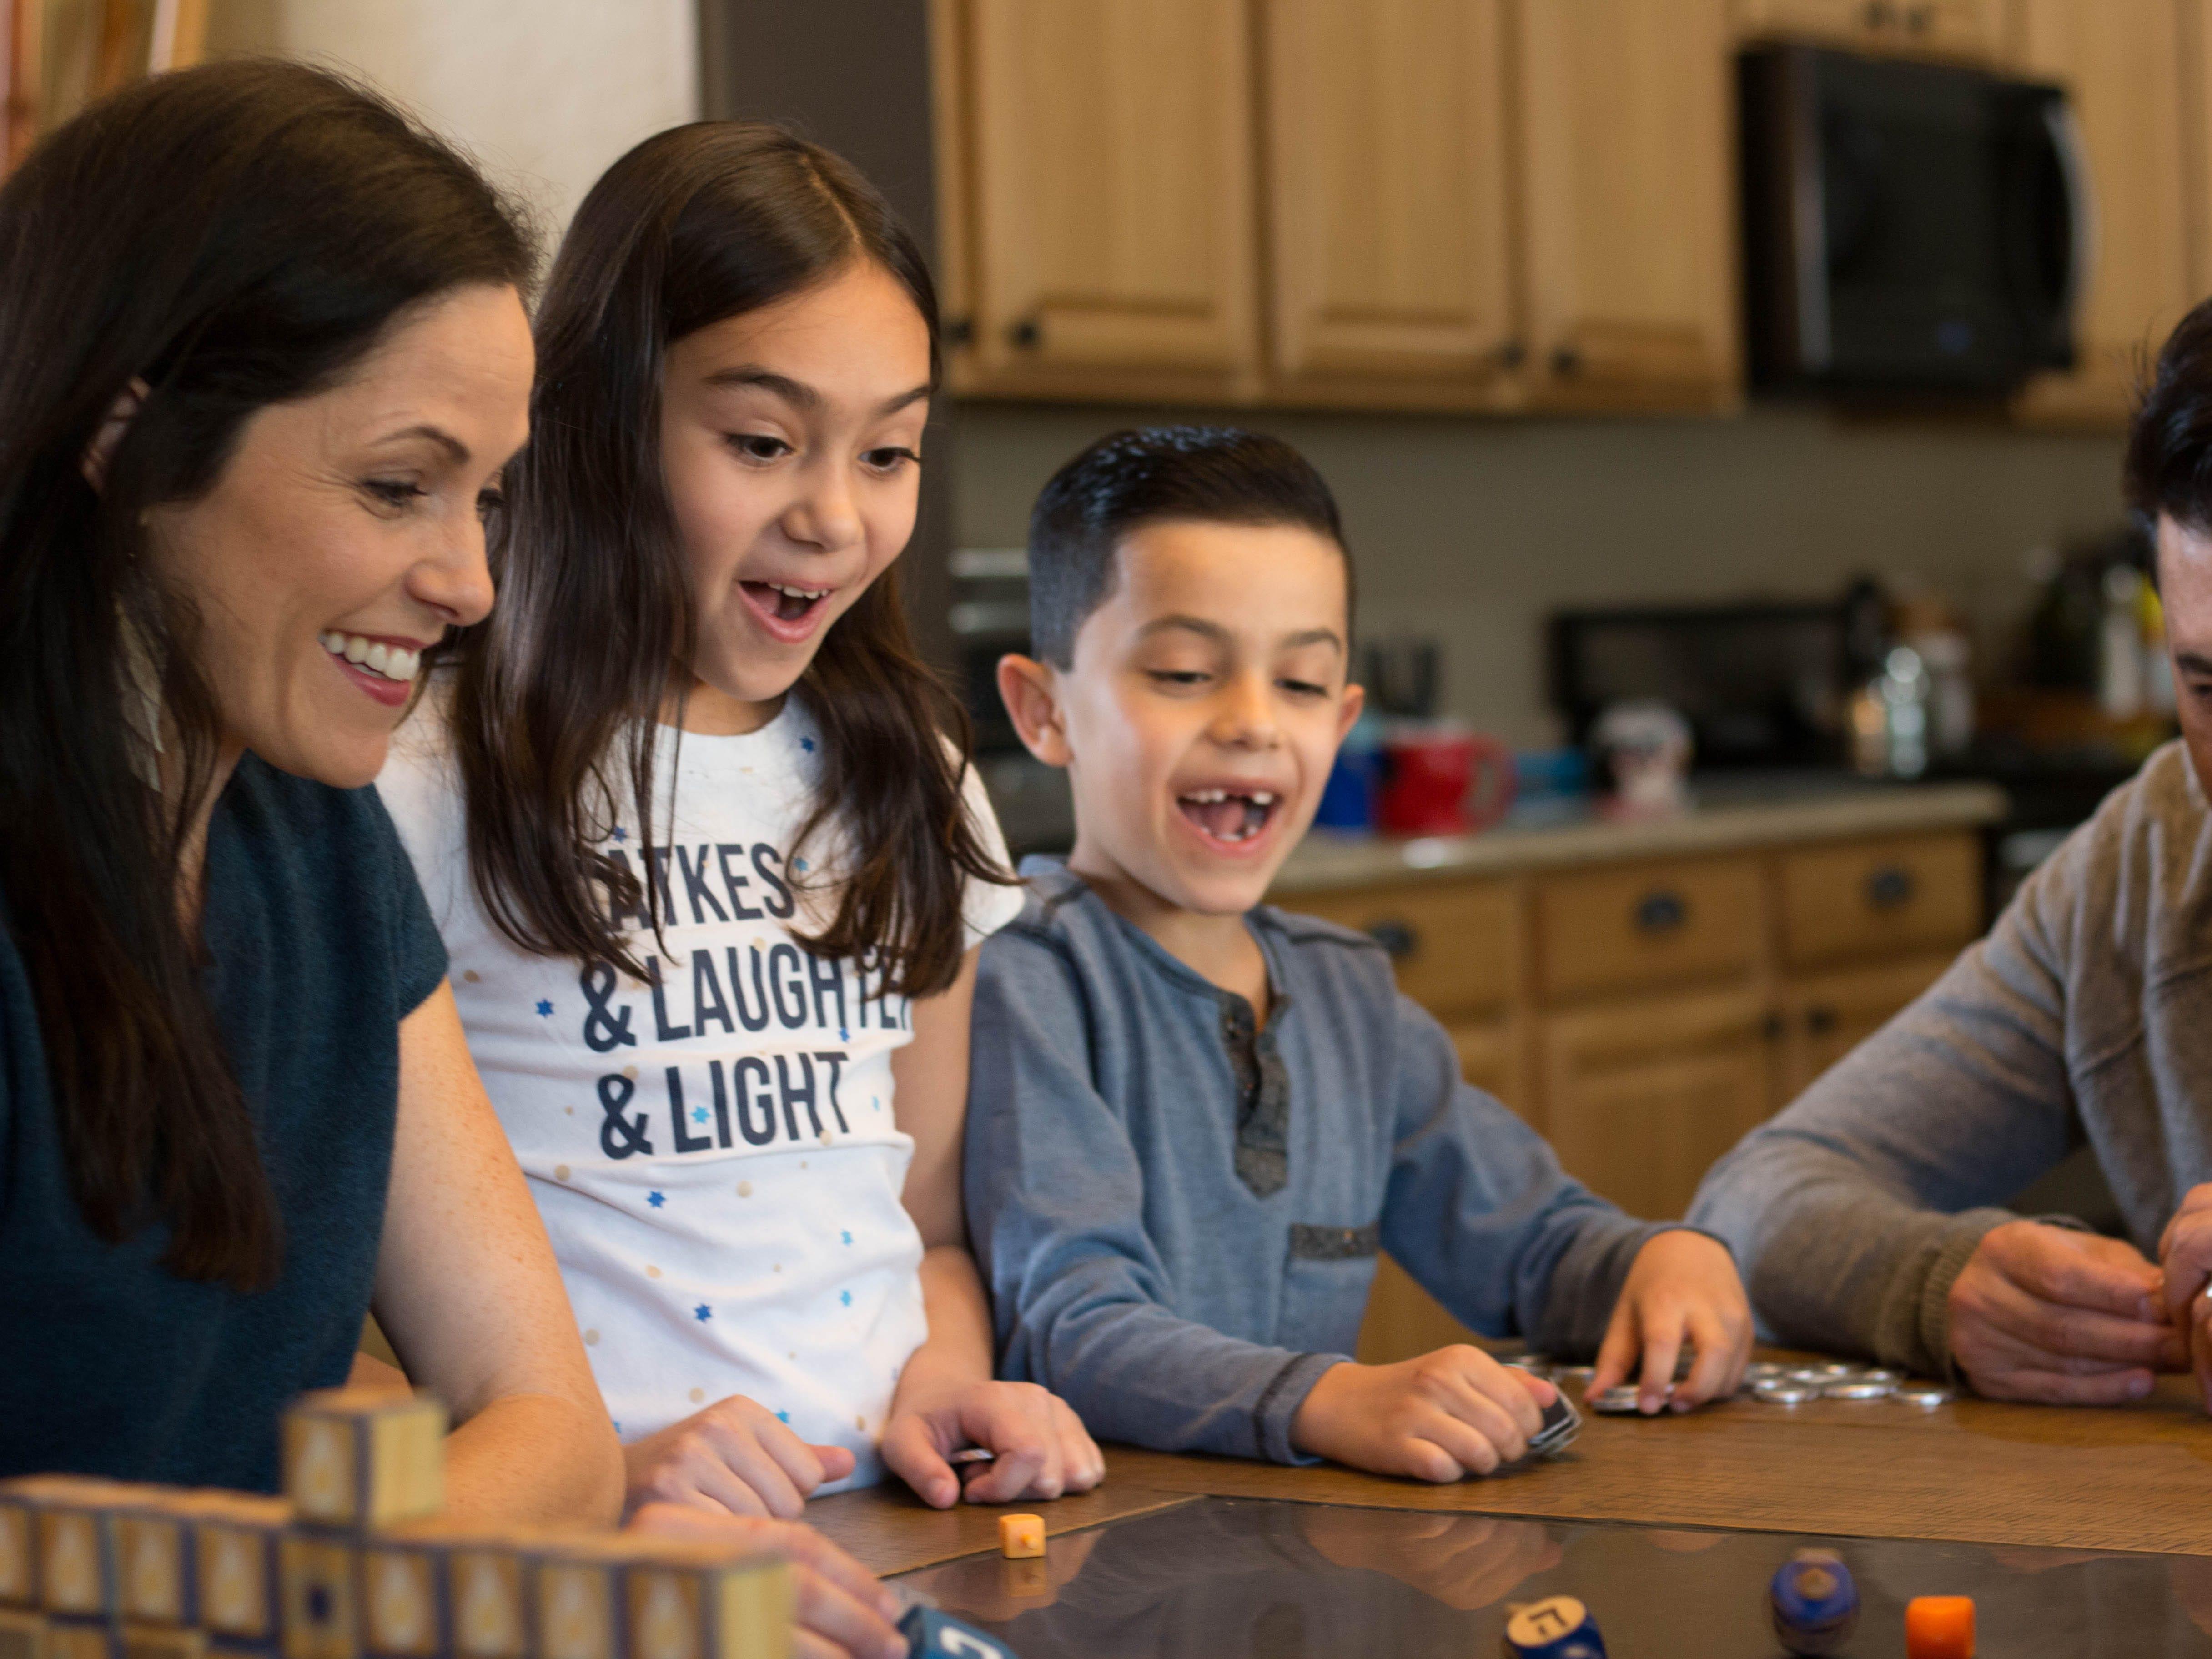 Hanukkah or Christmas? Interfaith families navigate how to raise their children